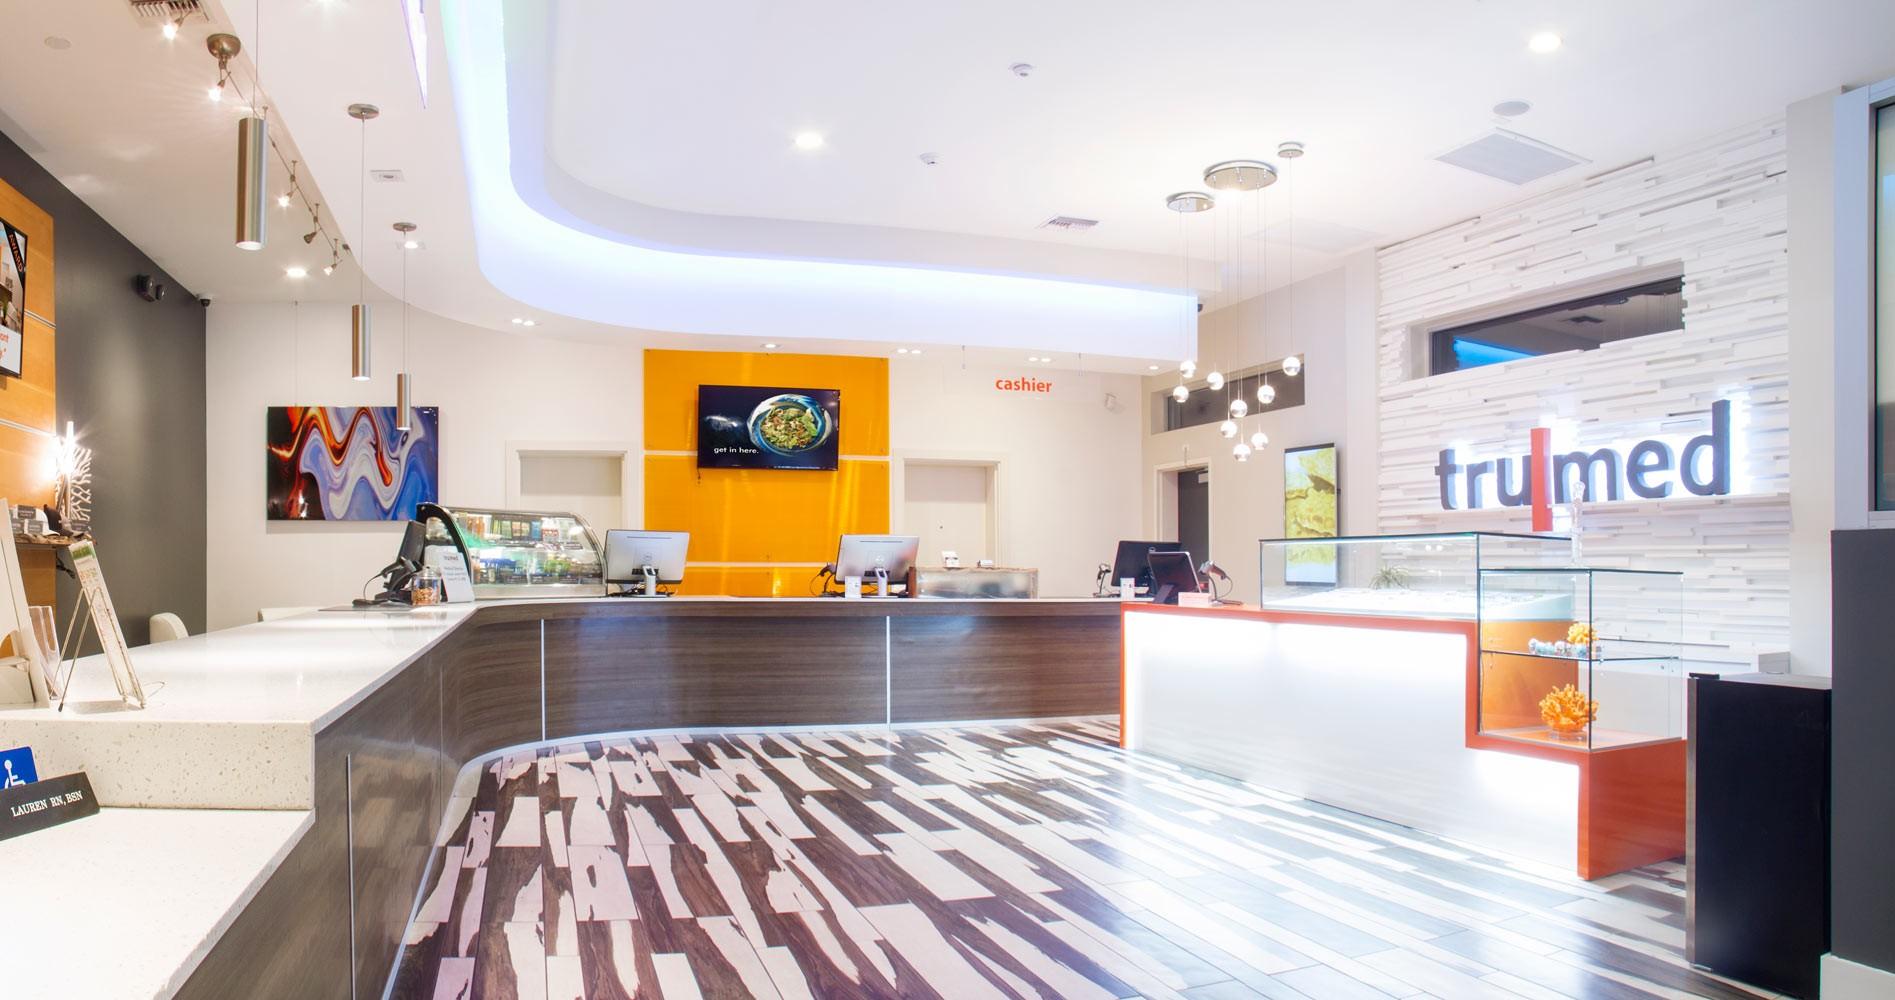 America 39 s best retail look might be this arizona hash bar cannabis - Cannabis interior ...